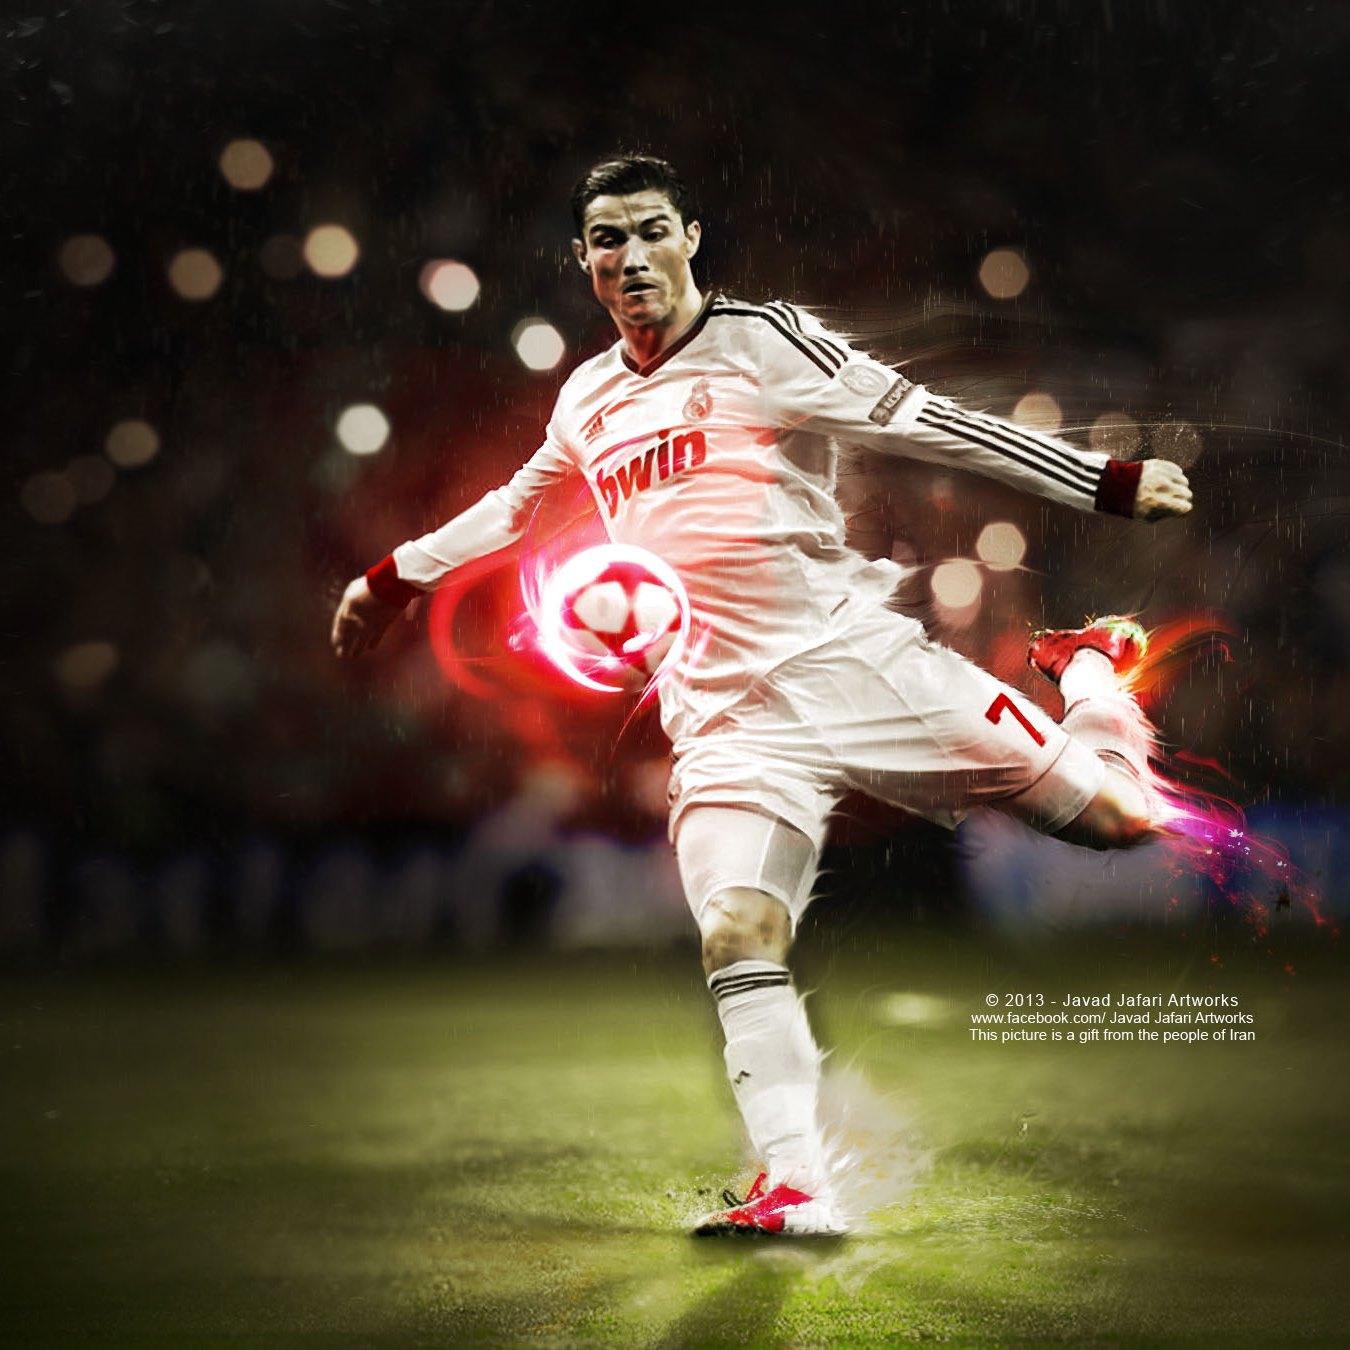 Hd wallpaper ronaldo - Cristiano Ronaldo Wallpapers Cr7 Hd Wallpaper